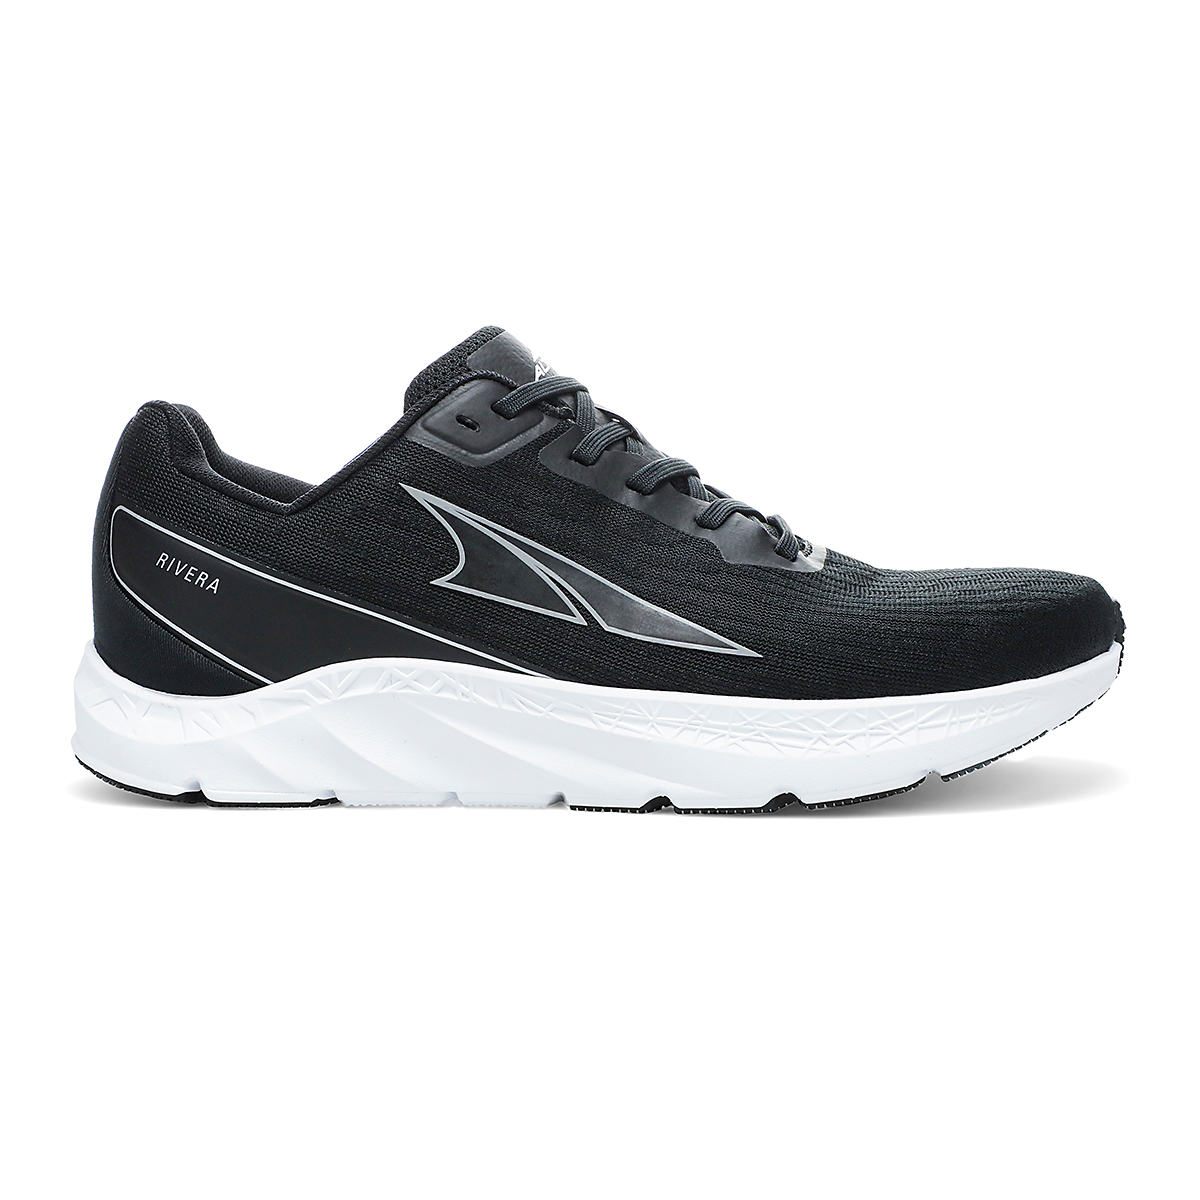 Women's Altra Rivera Running Shoe - Color: Black/White - Size: 5.5 - Width: Regular, Black/White, large, image 1